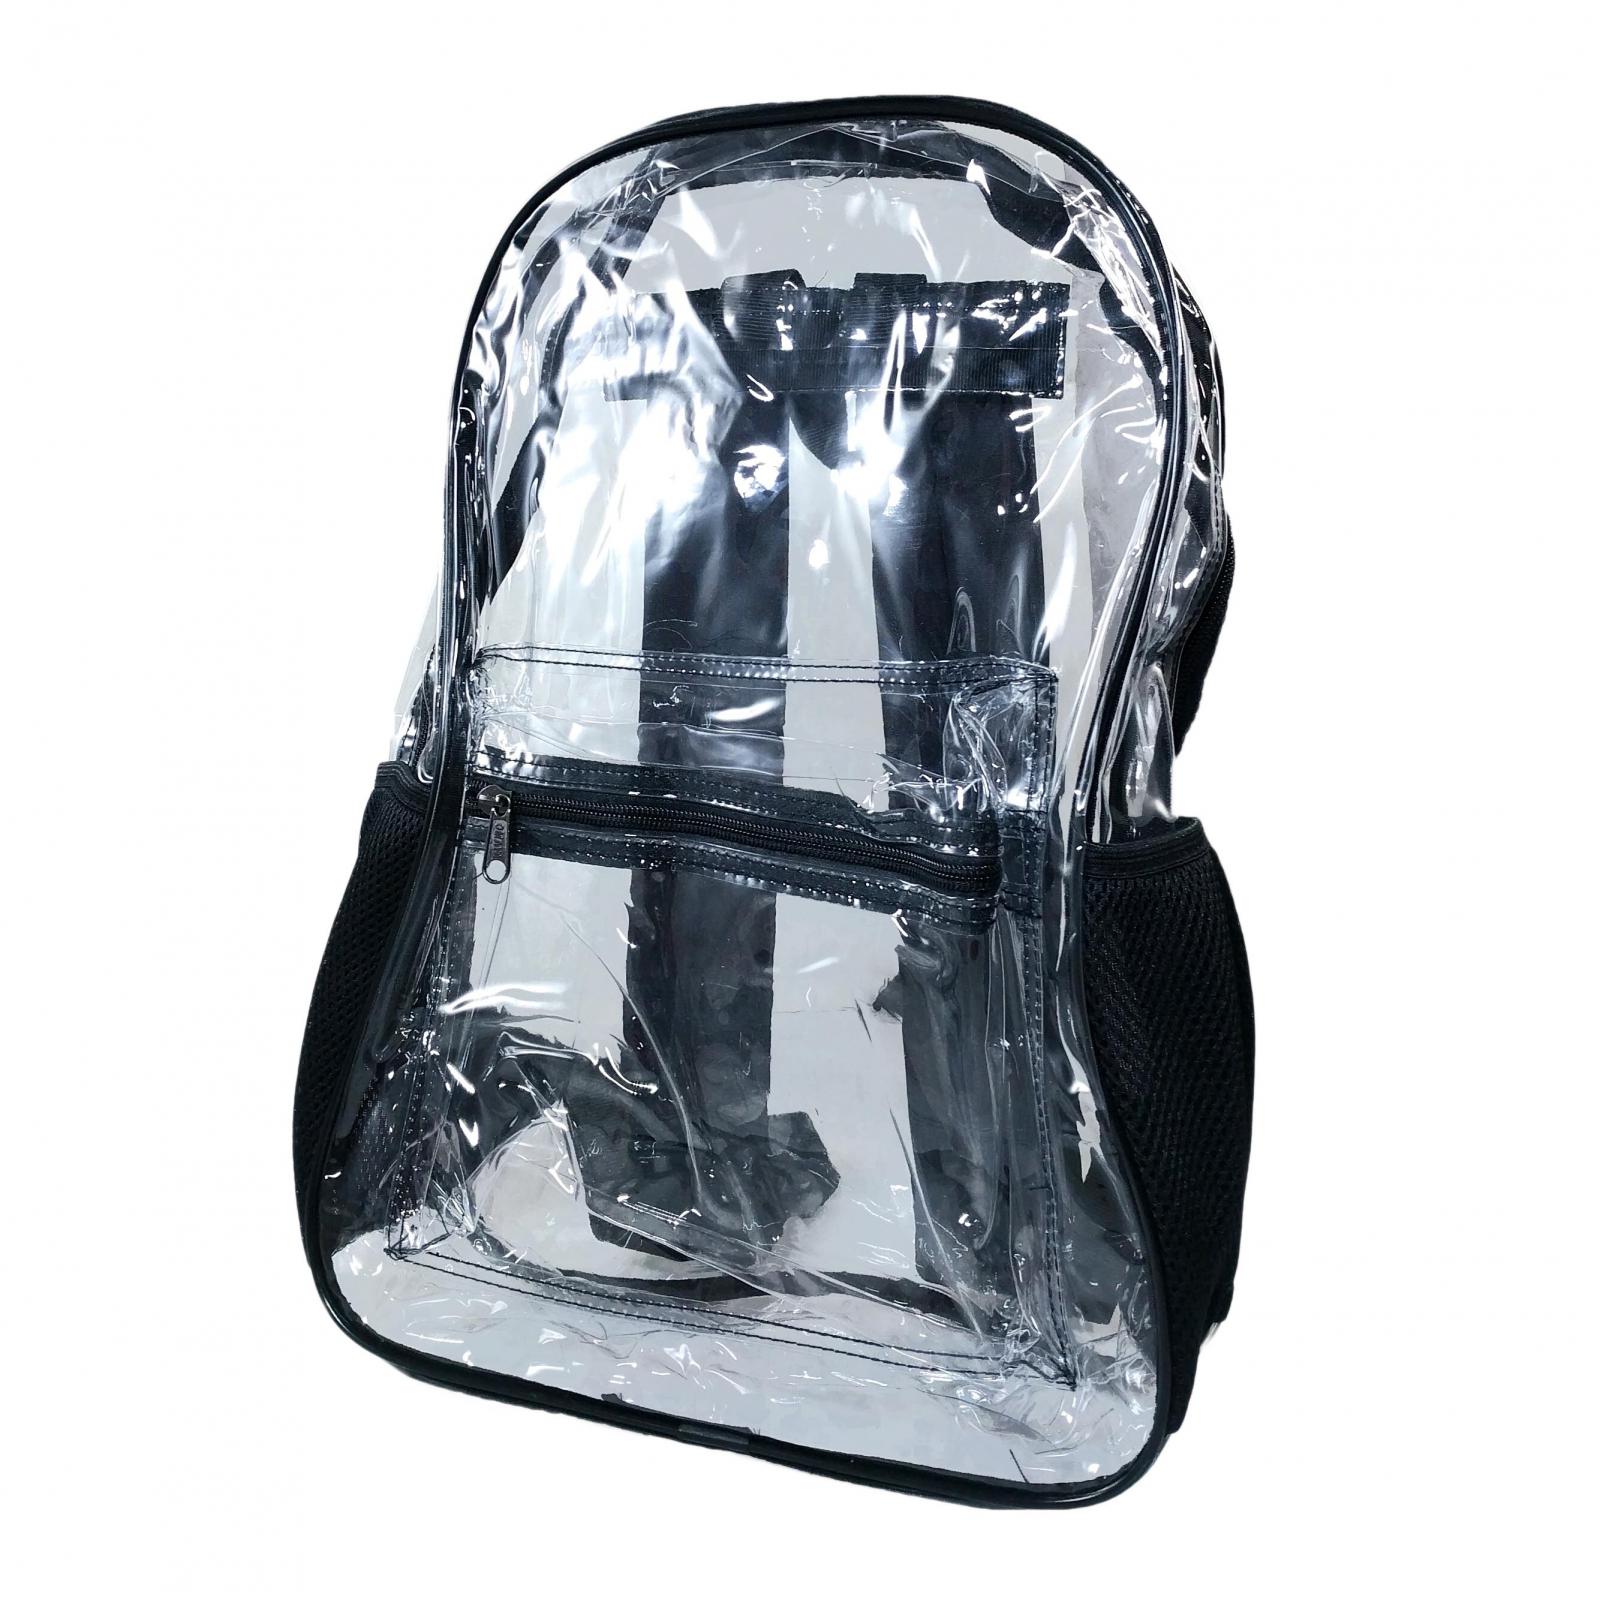 ASR Outdoor Transparent PVC Security Backpack Black Trim